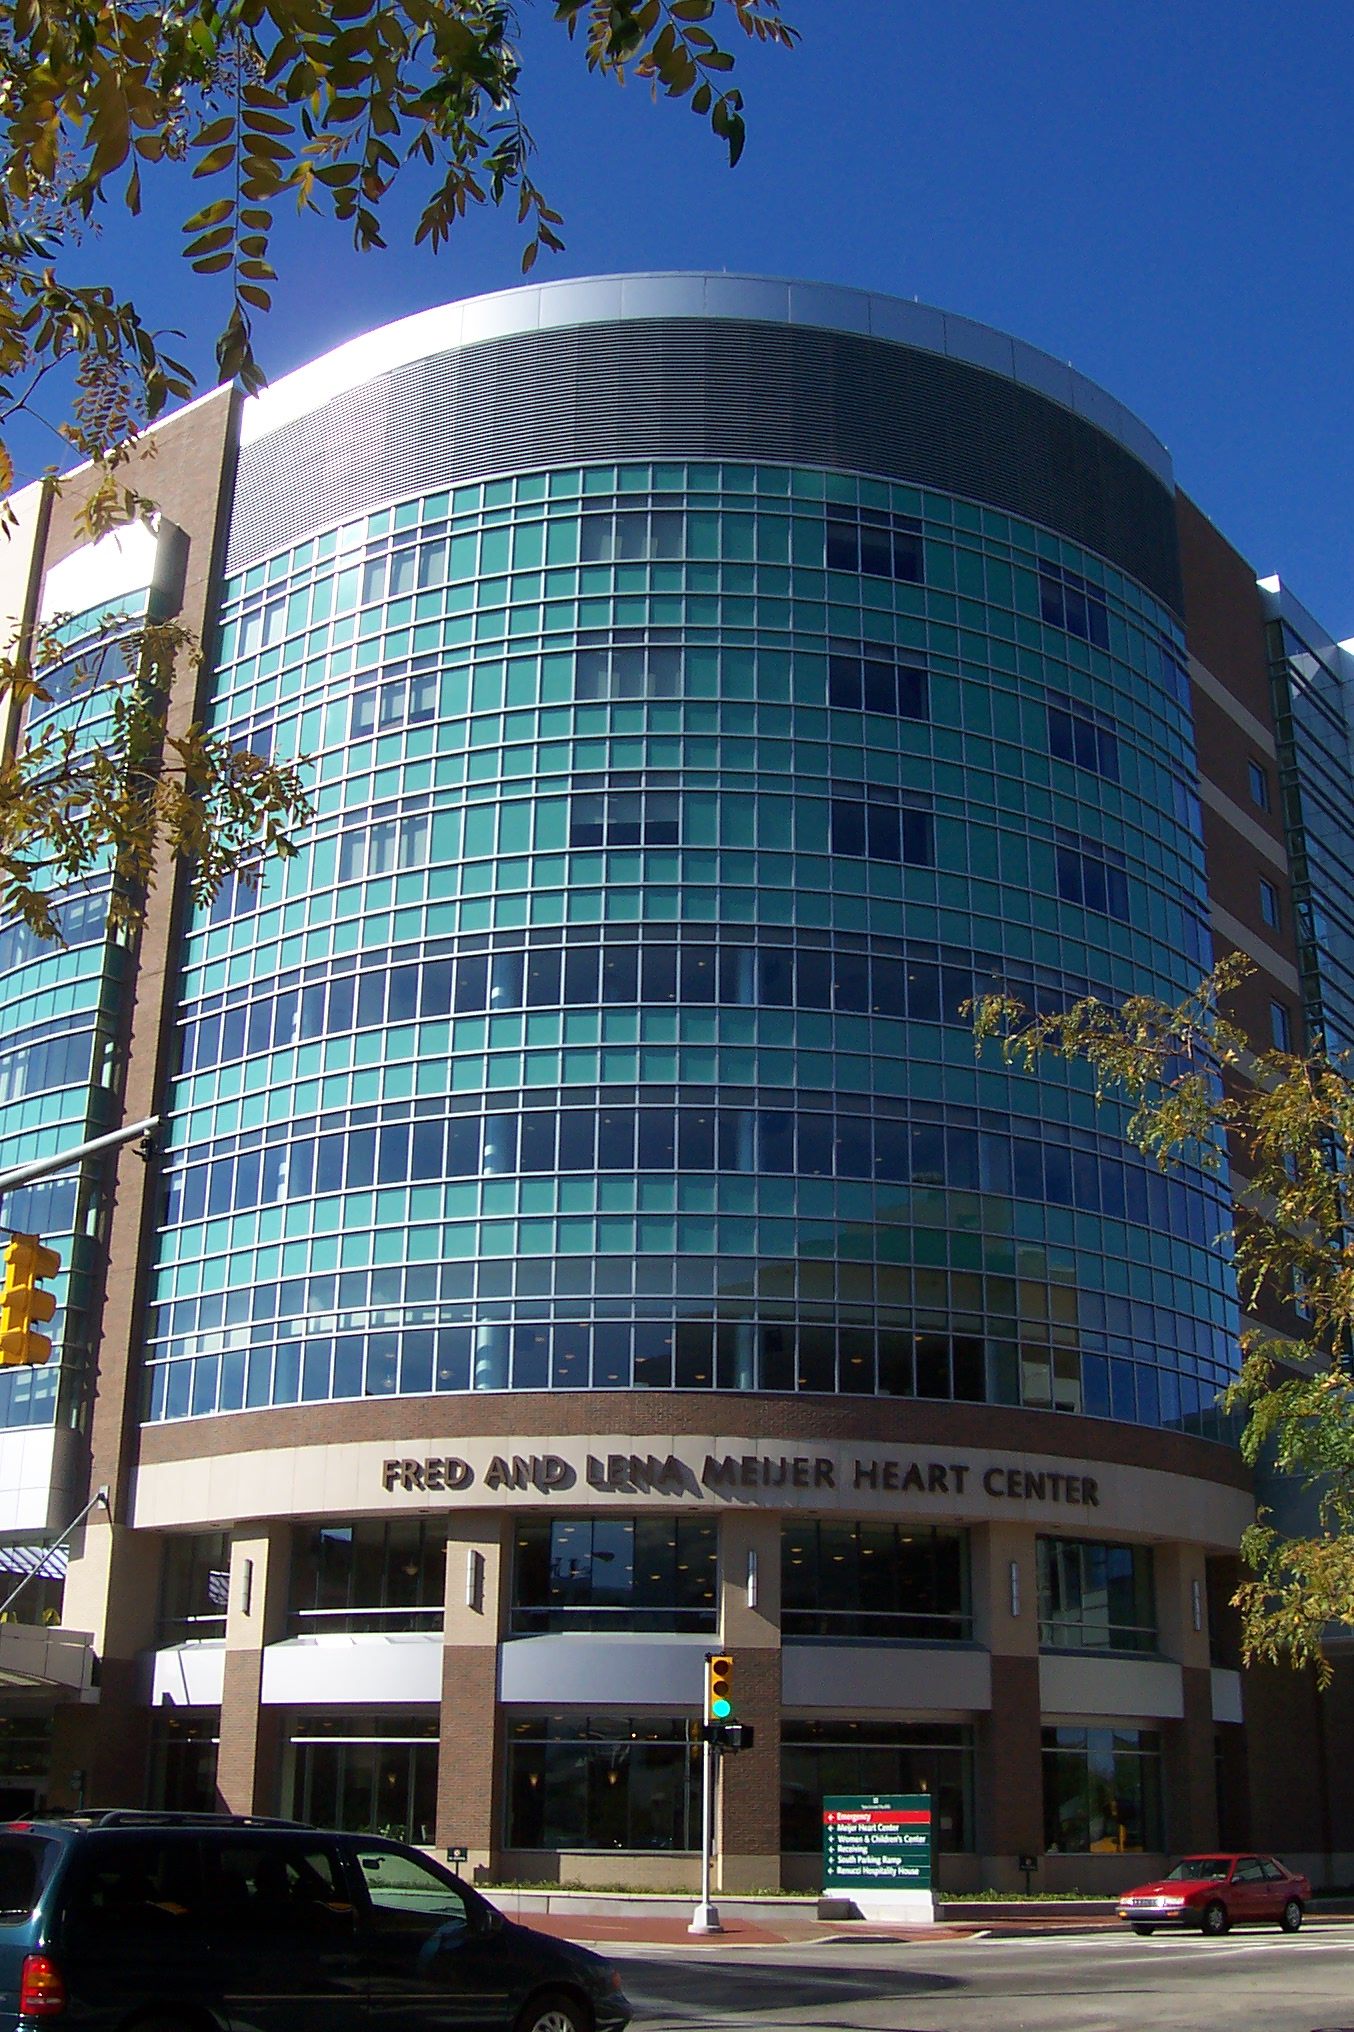 File:Meijer Heart Center jpg - Wikimedia Commons